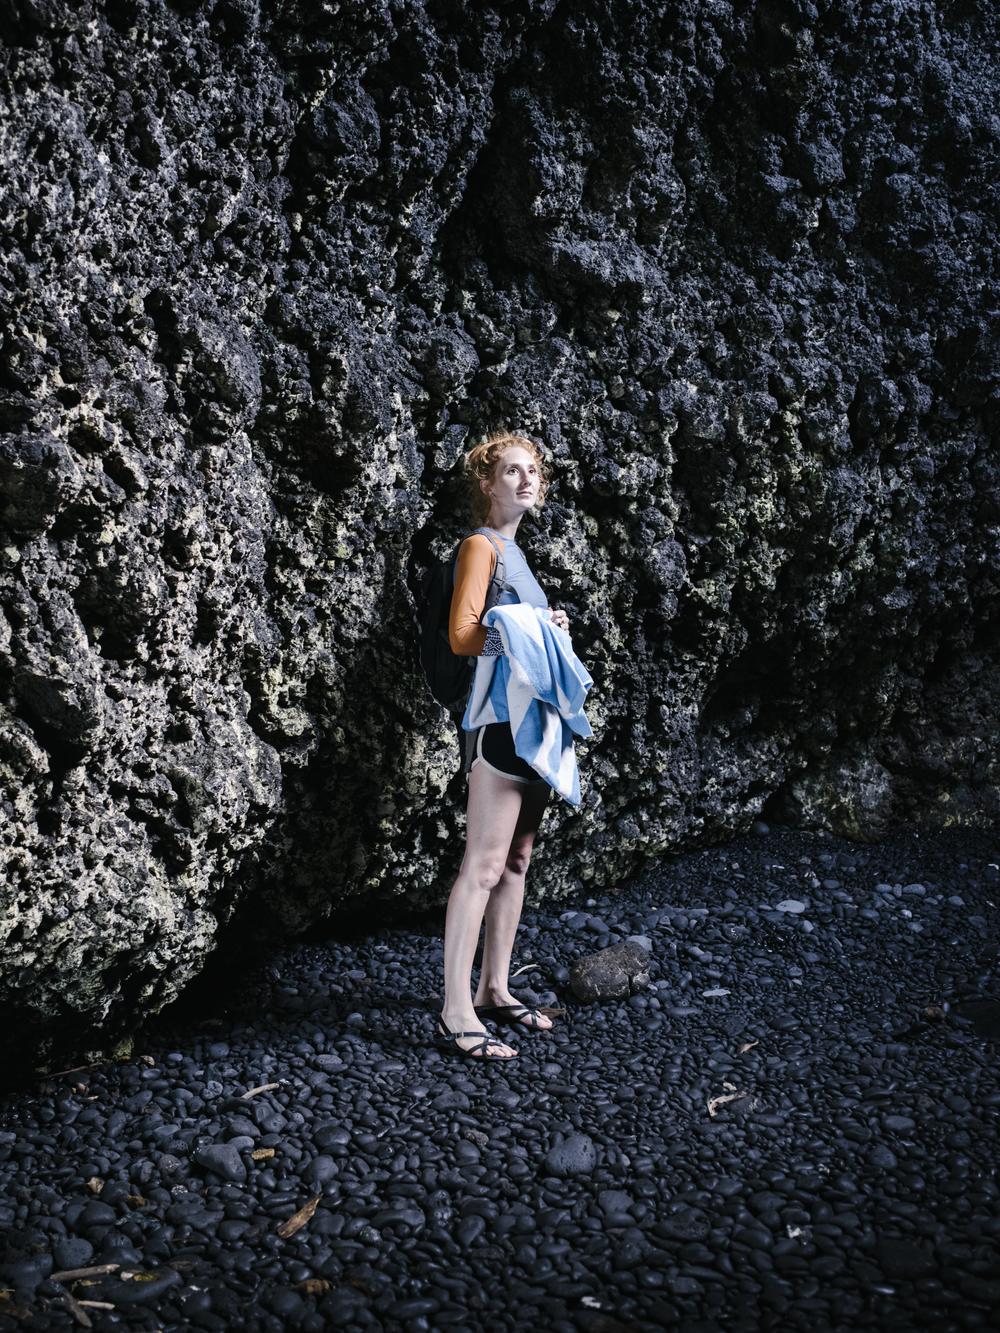 Road_Trip_Hawaii_Julia_Cave_Portrait-1.jpg